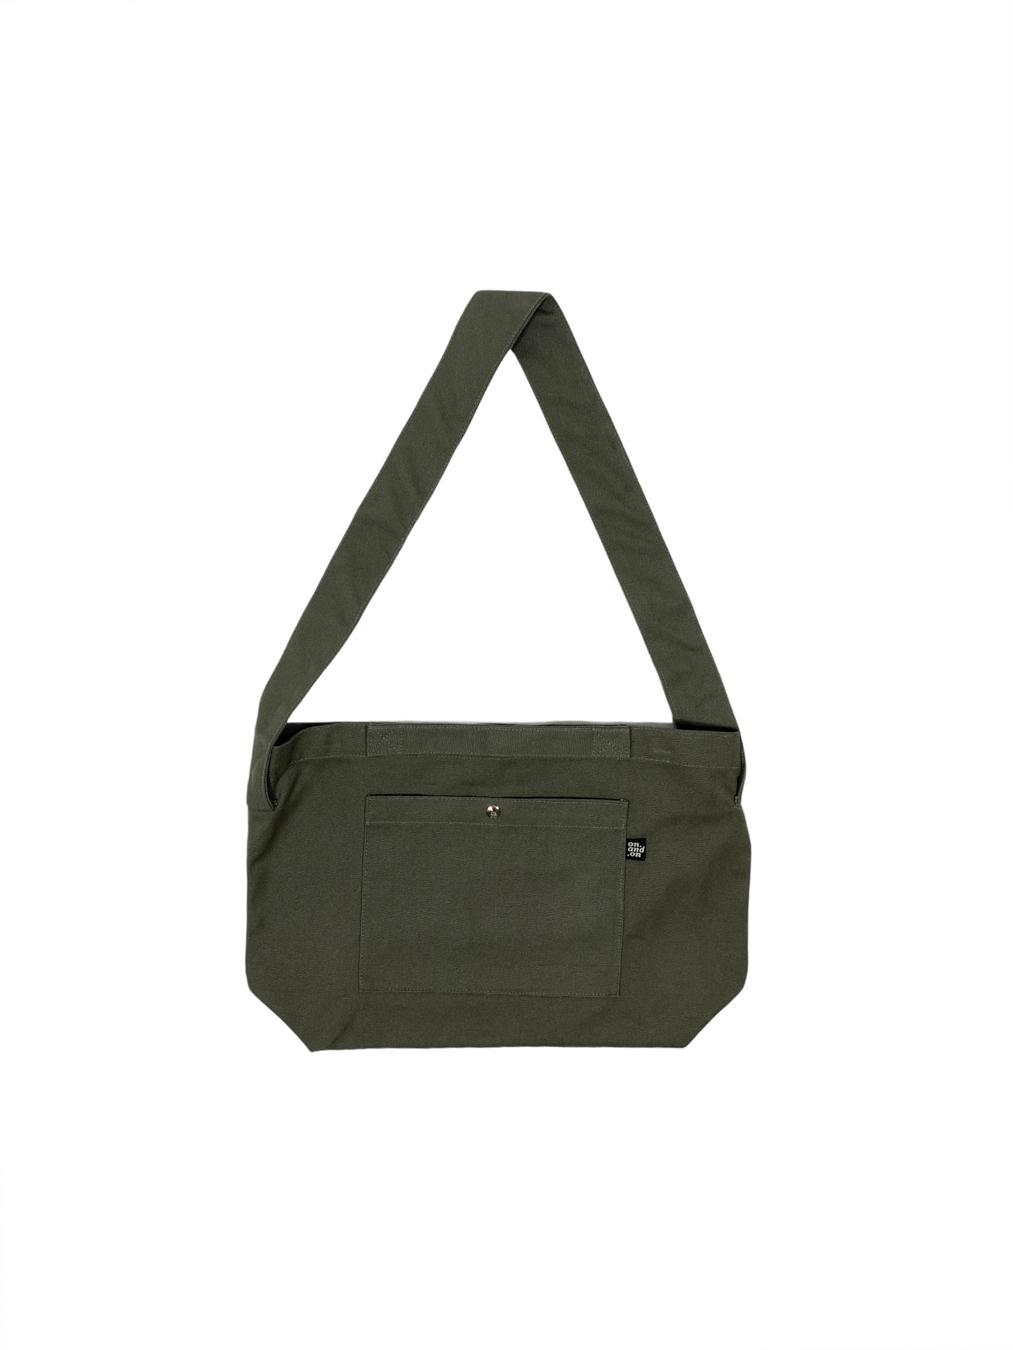 Nerdy Bag (Social)